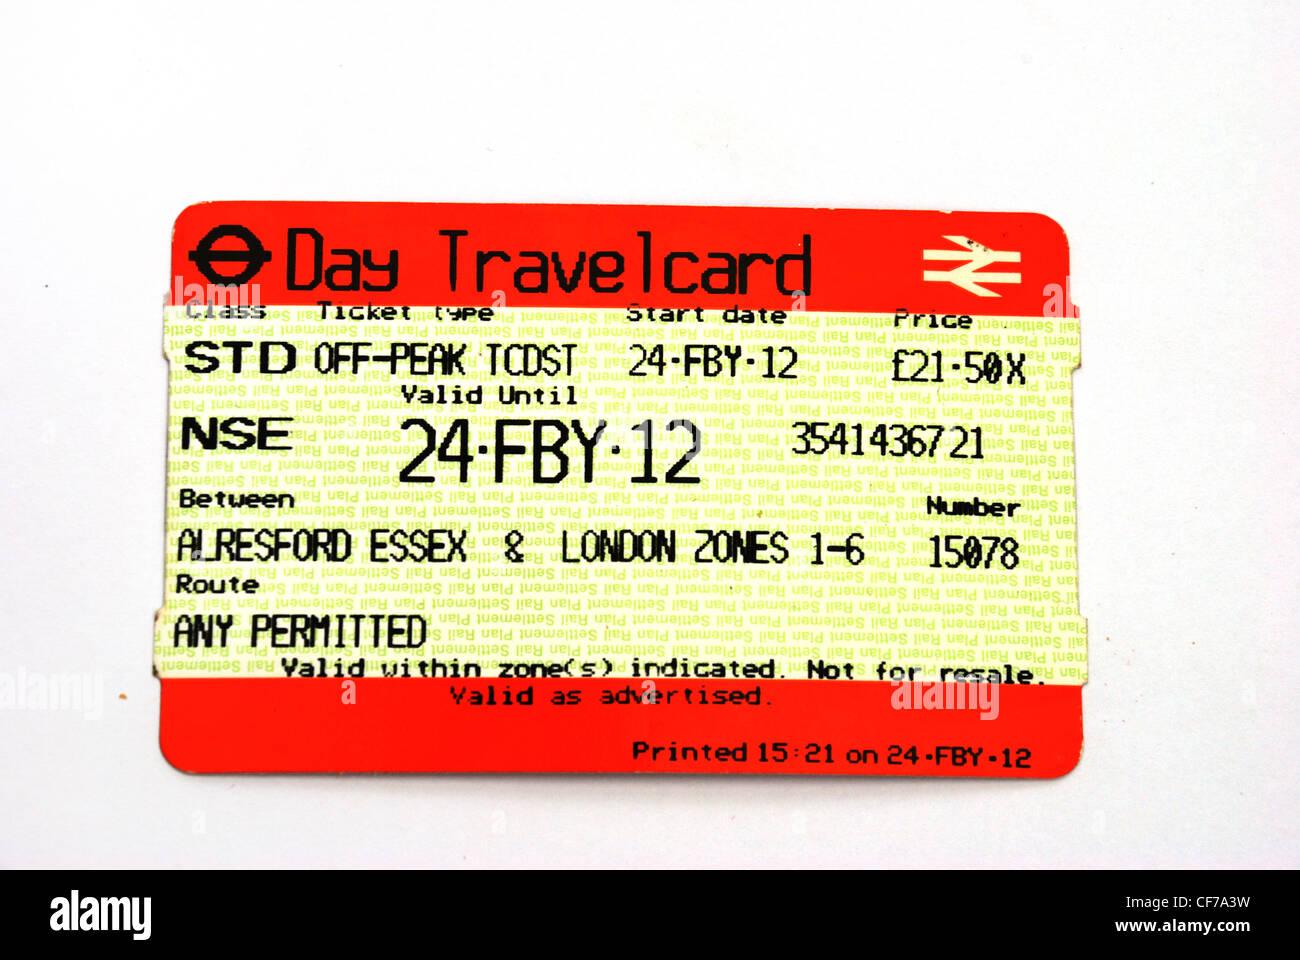 Travelcard rail ticket - Stock Image